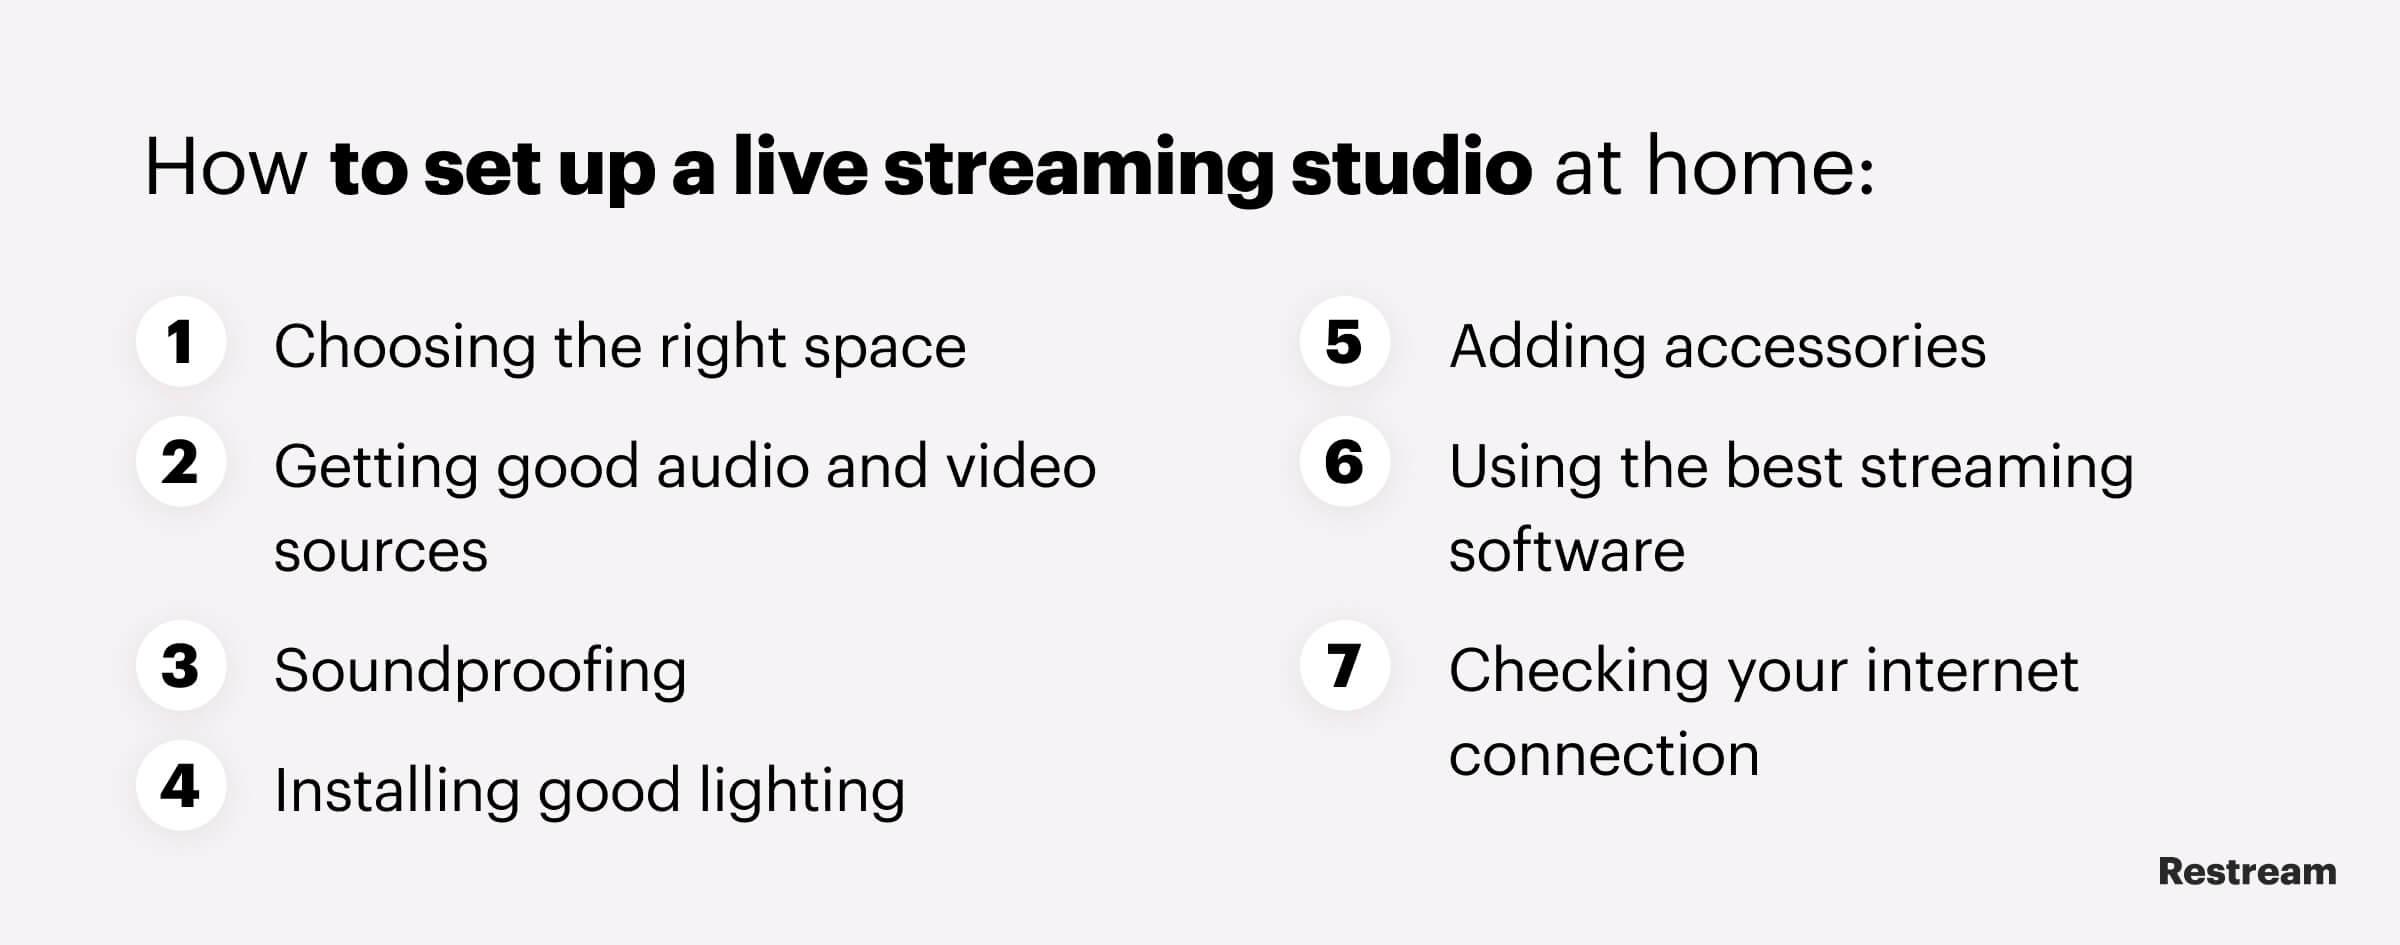 Checklist: How to set up a home live streaming studio